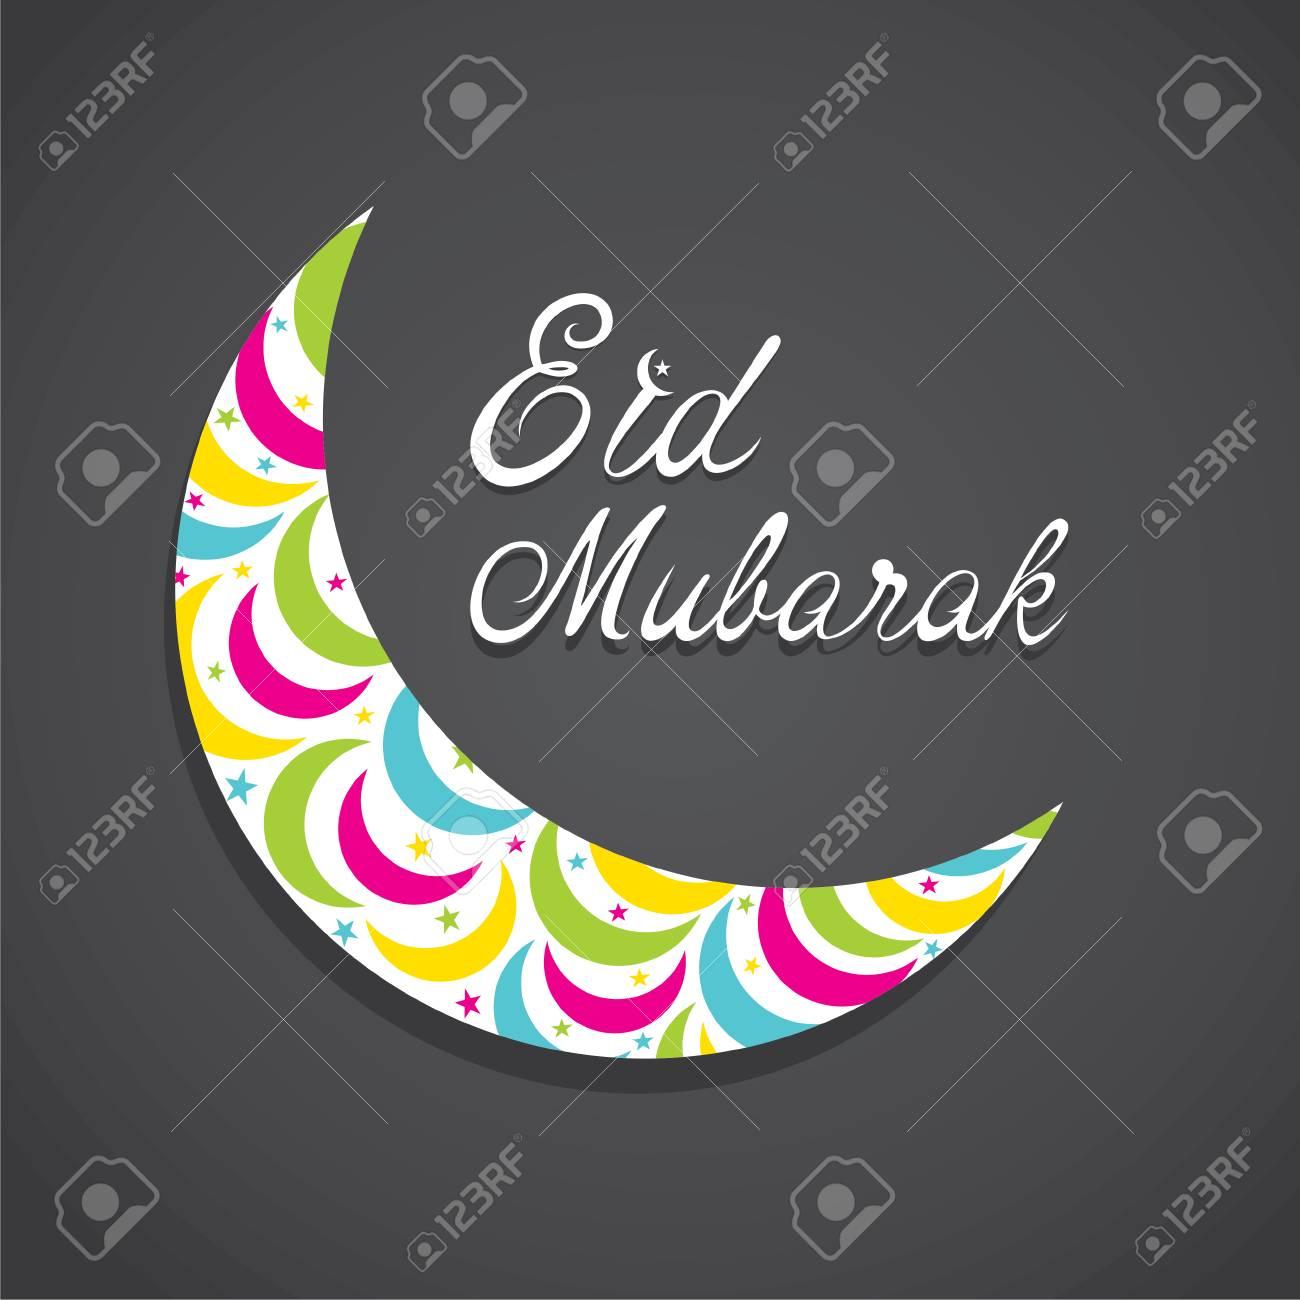 creative Eid Mubarak Islamic festival greeting card design vector